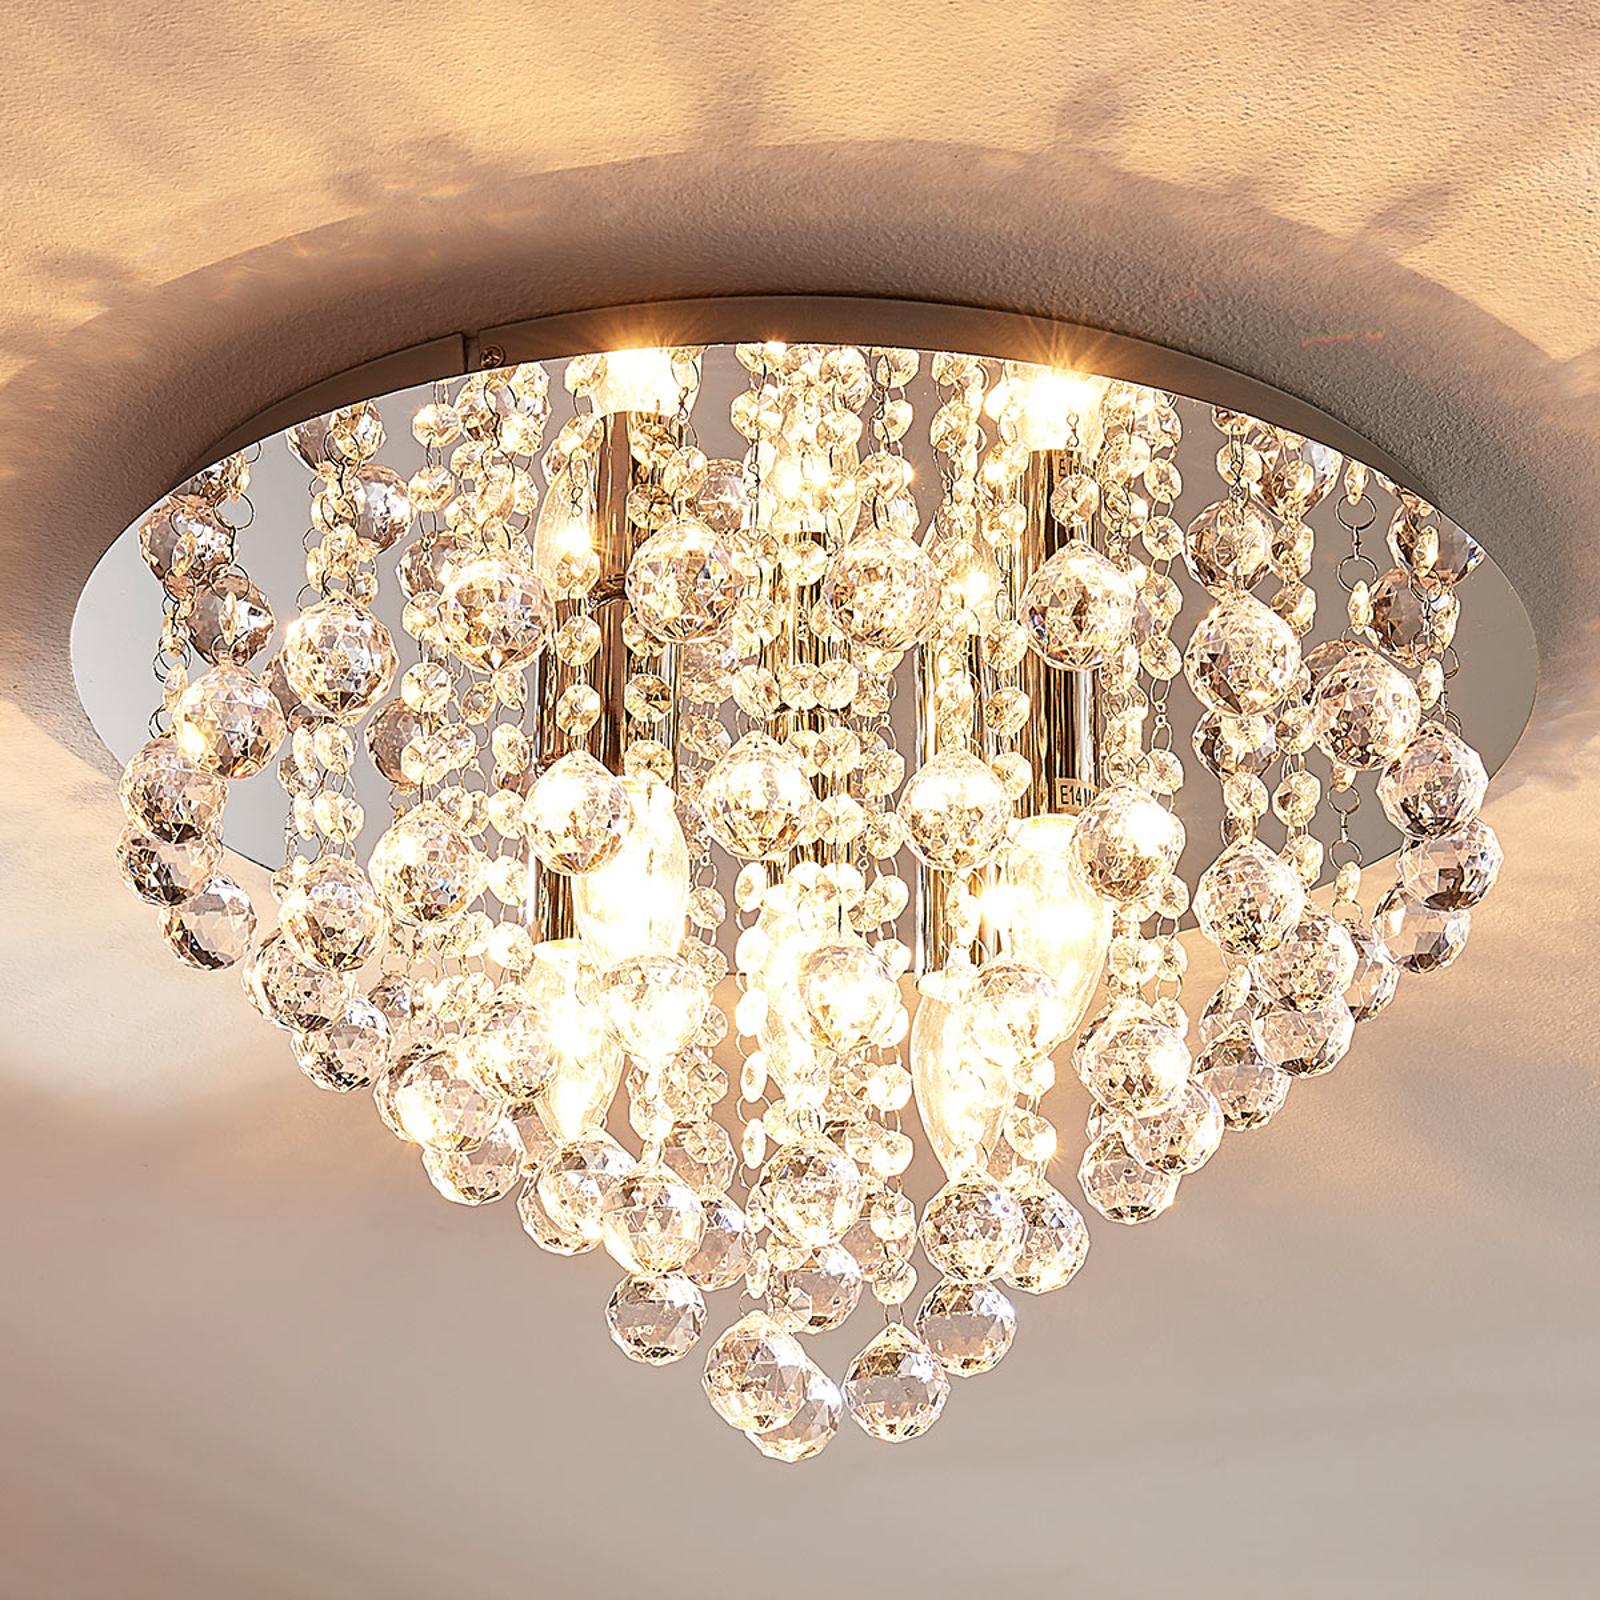 Fonkelende plafondlamp Annica met chromen plaat